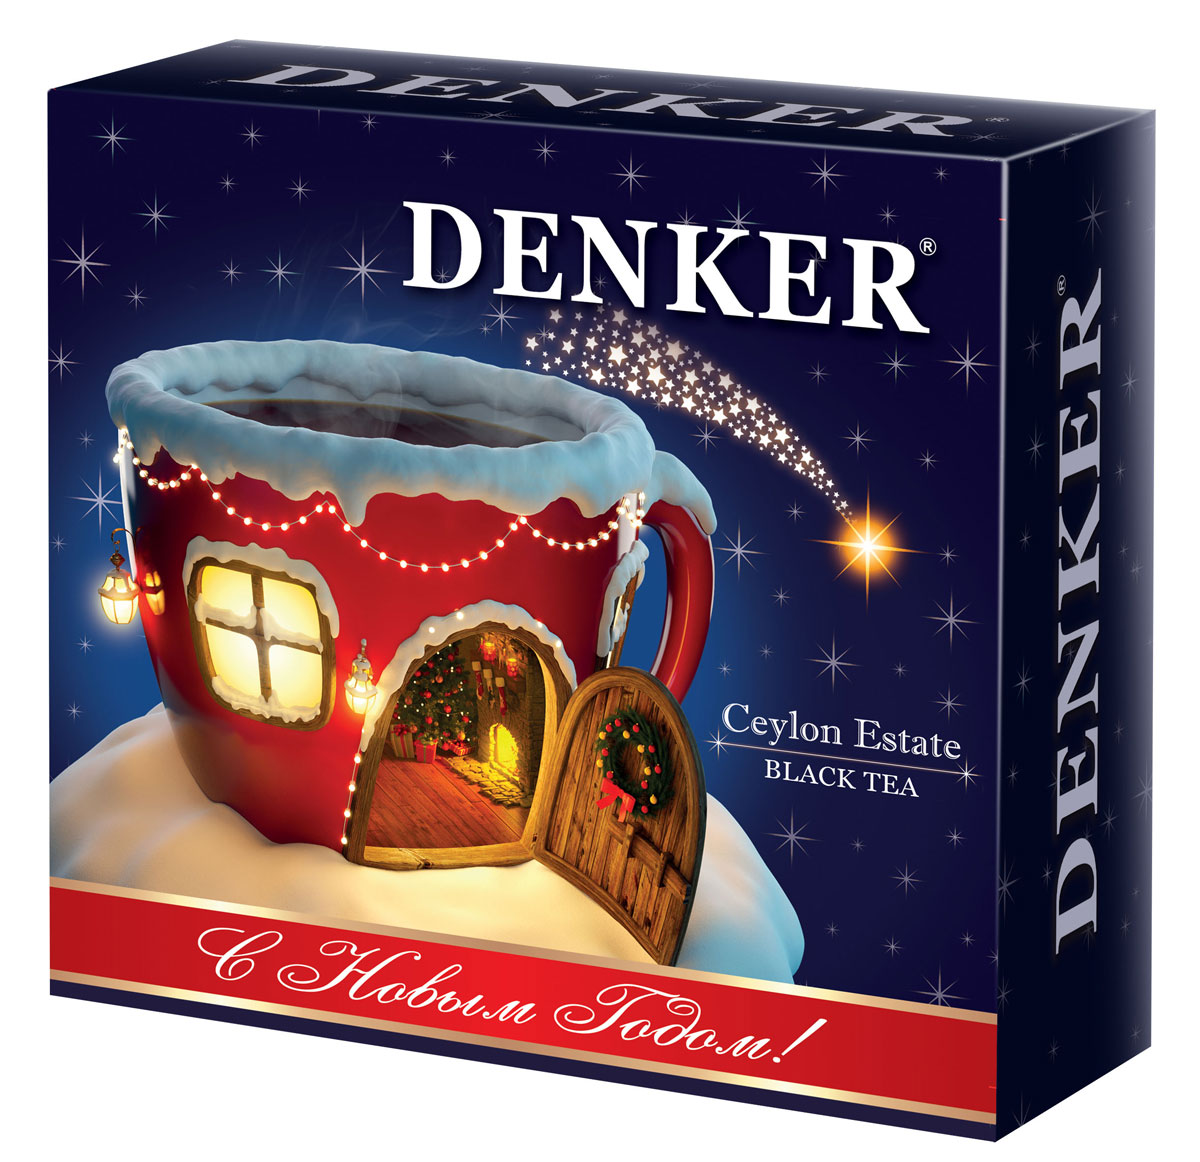 Denker Ceylon Estate Новый Год чай черный цейлонский мелкий, 200 г corporate real estate management in tanzania